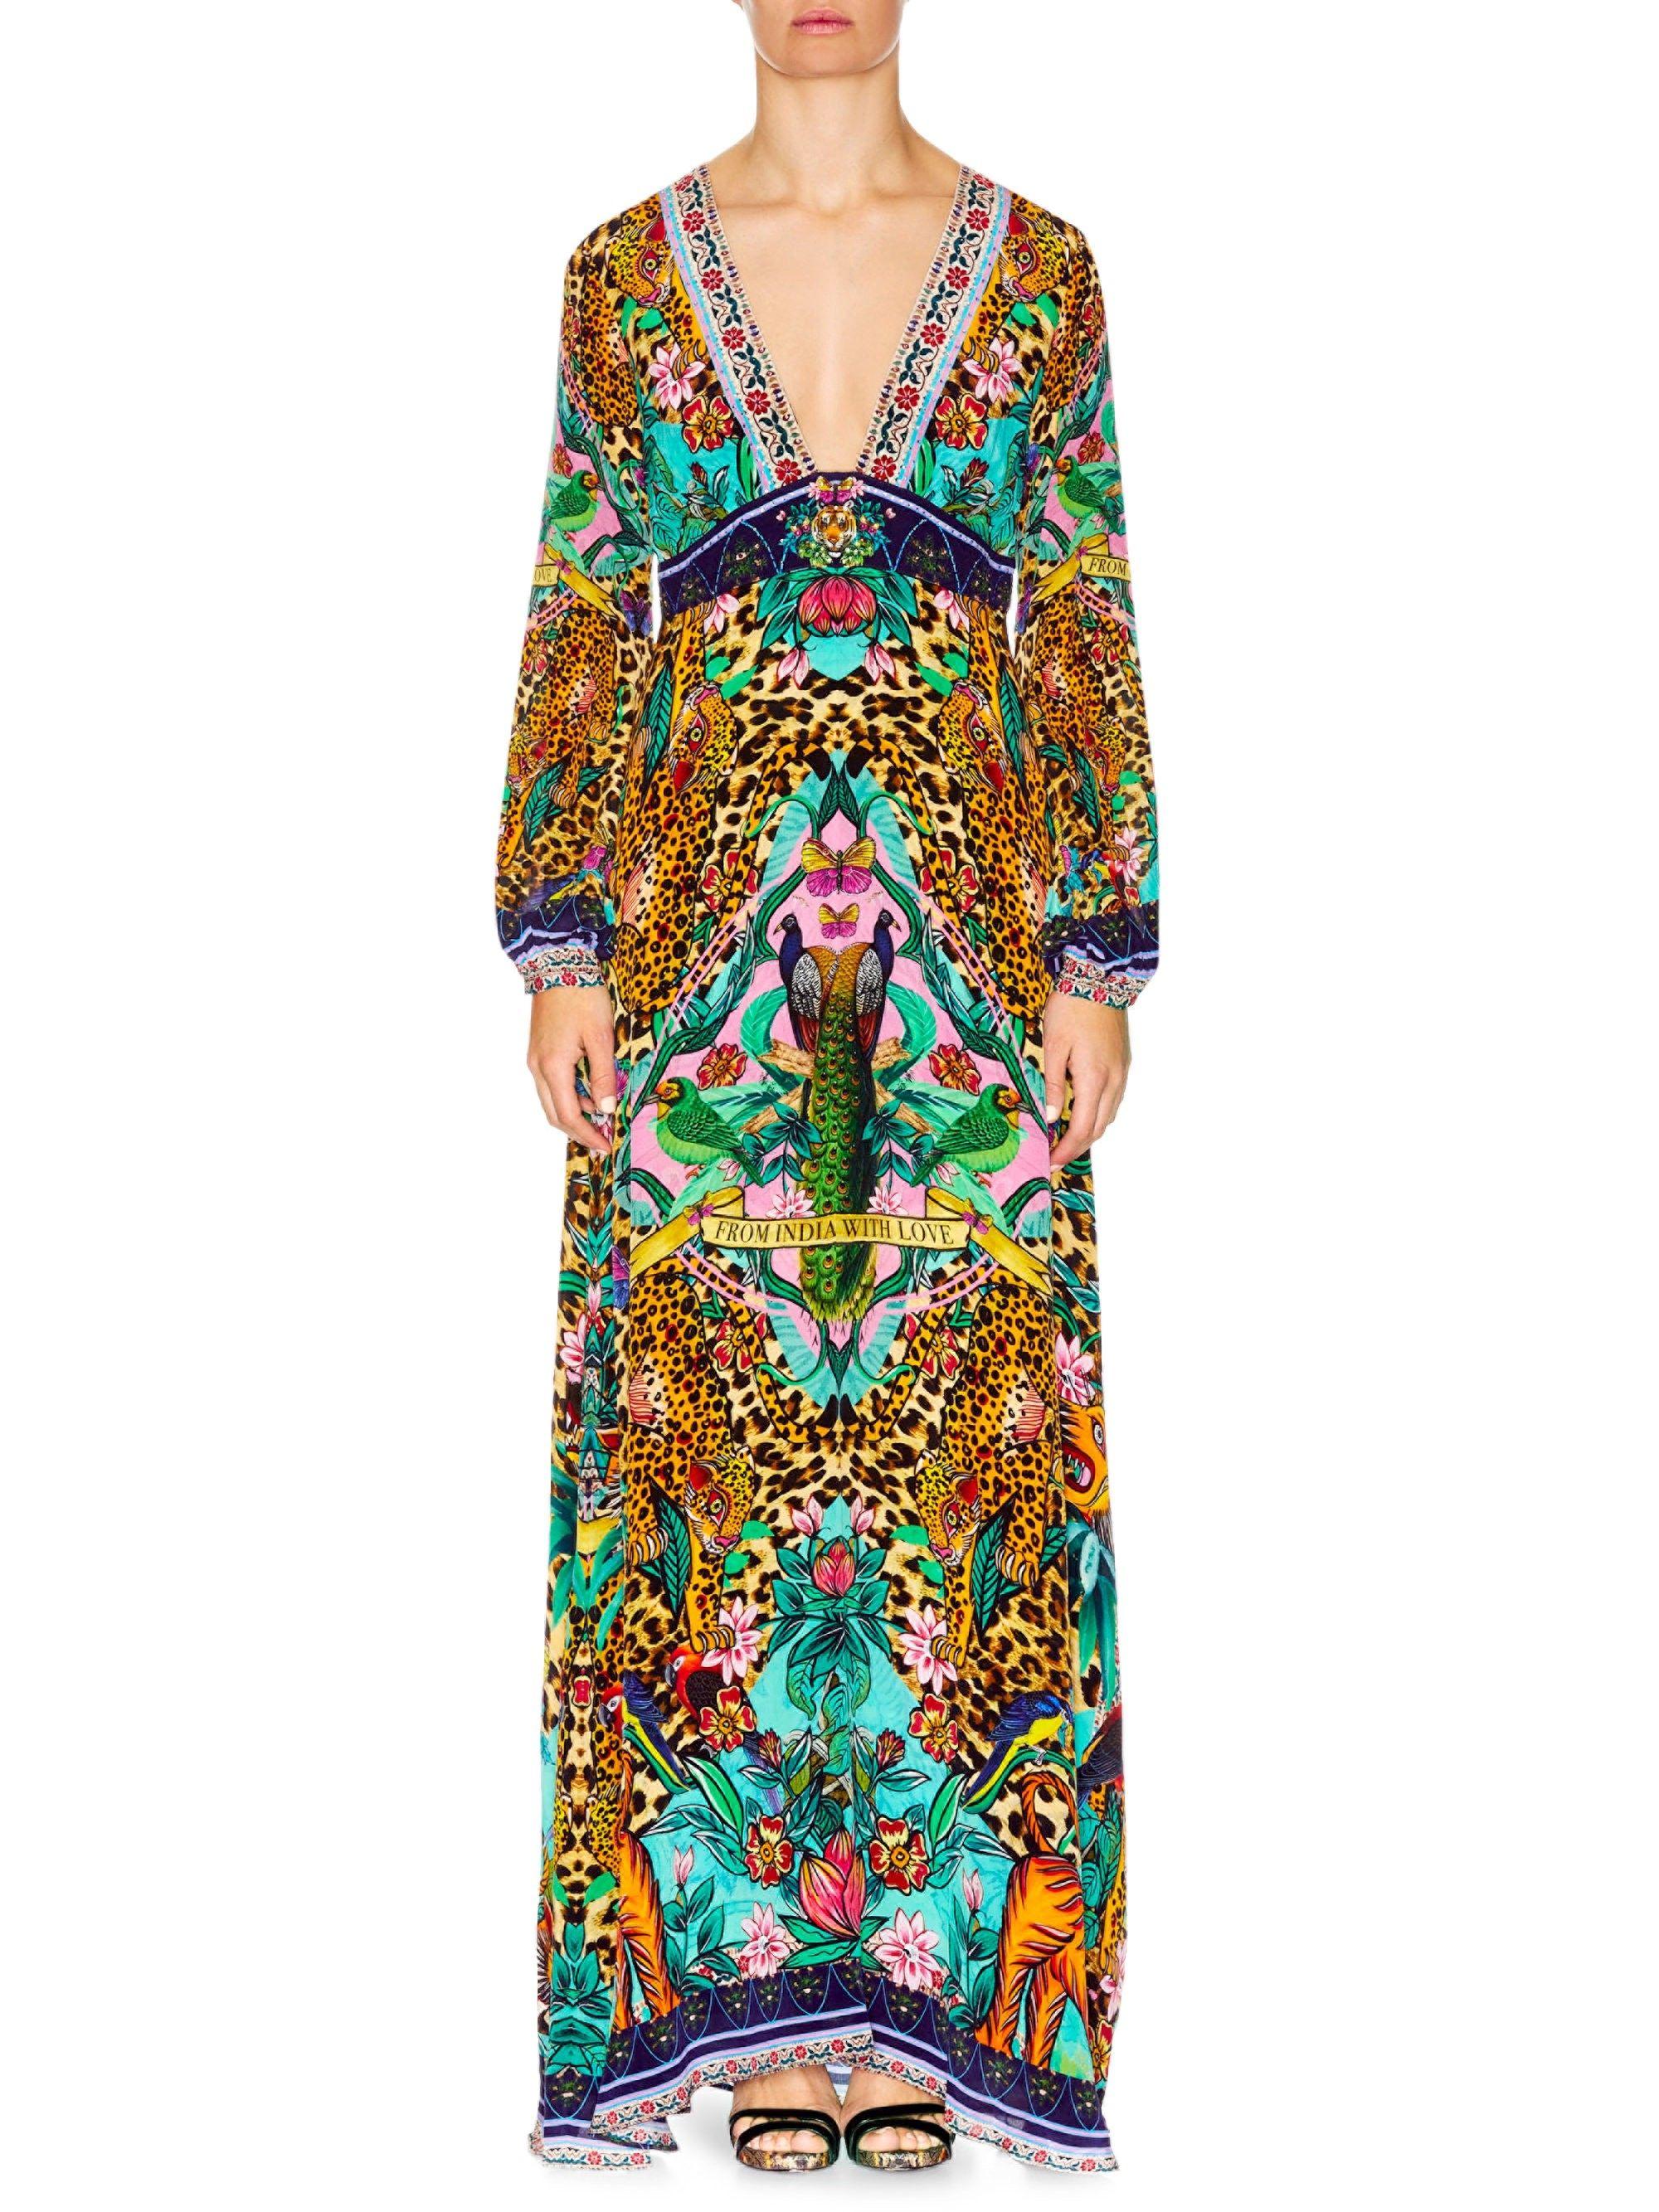 Camilla bell sleeve maxi dress the jungle book xsmall pinterest